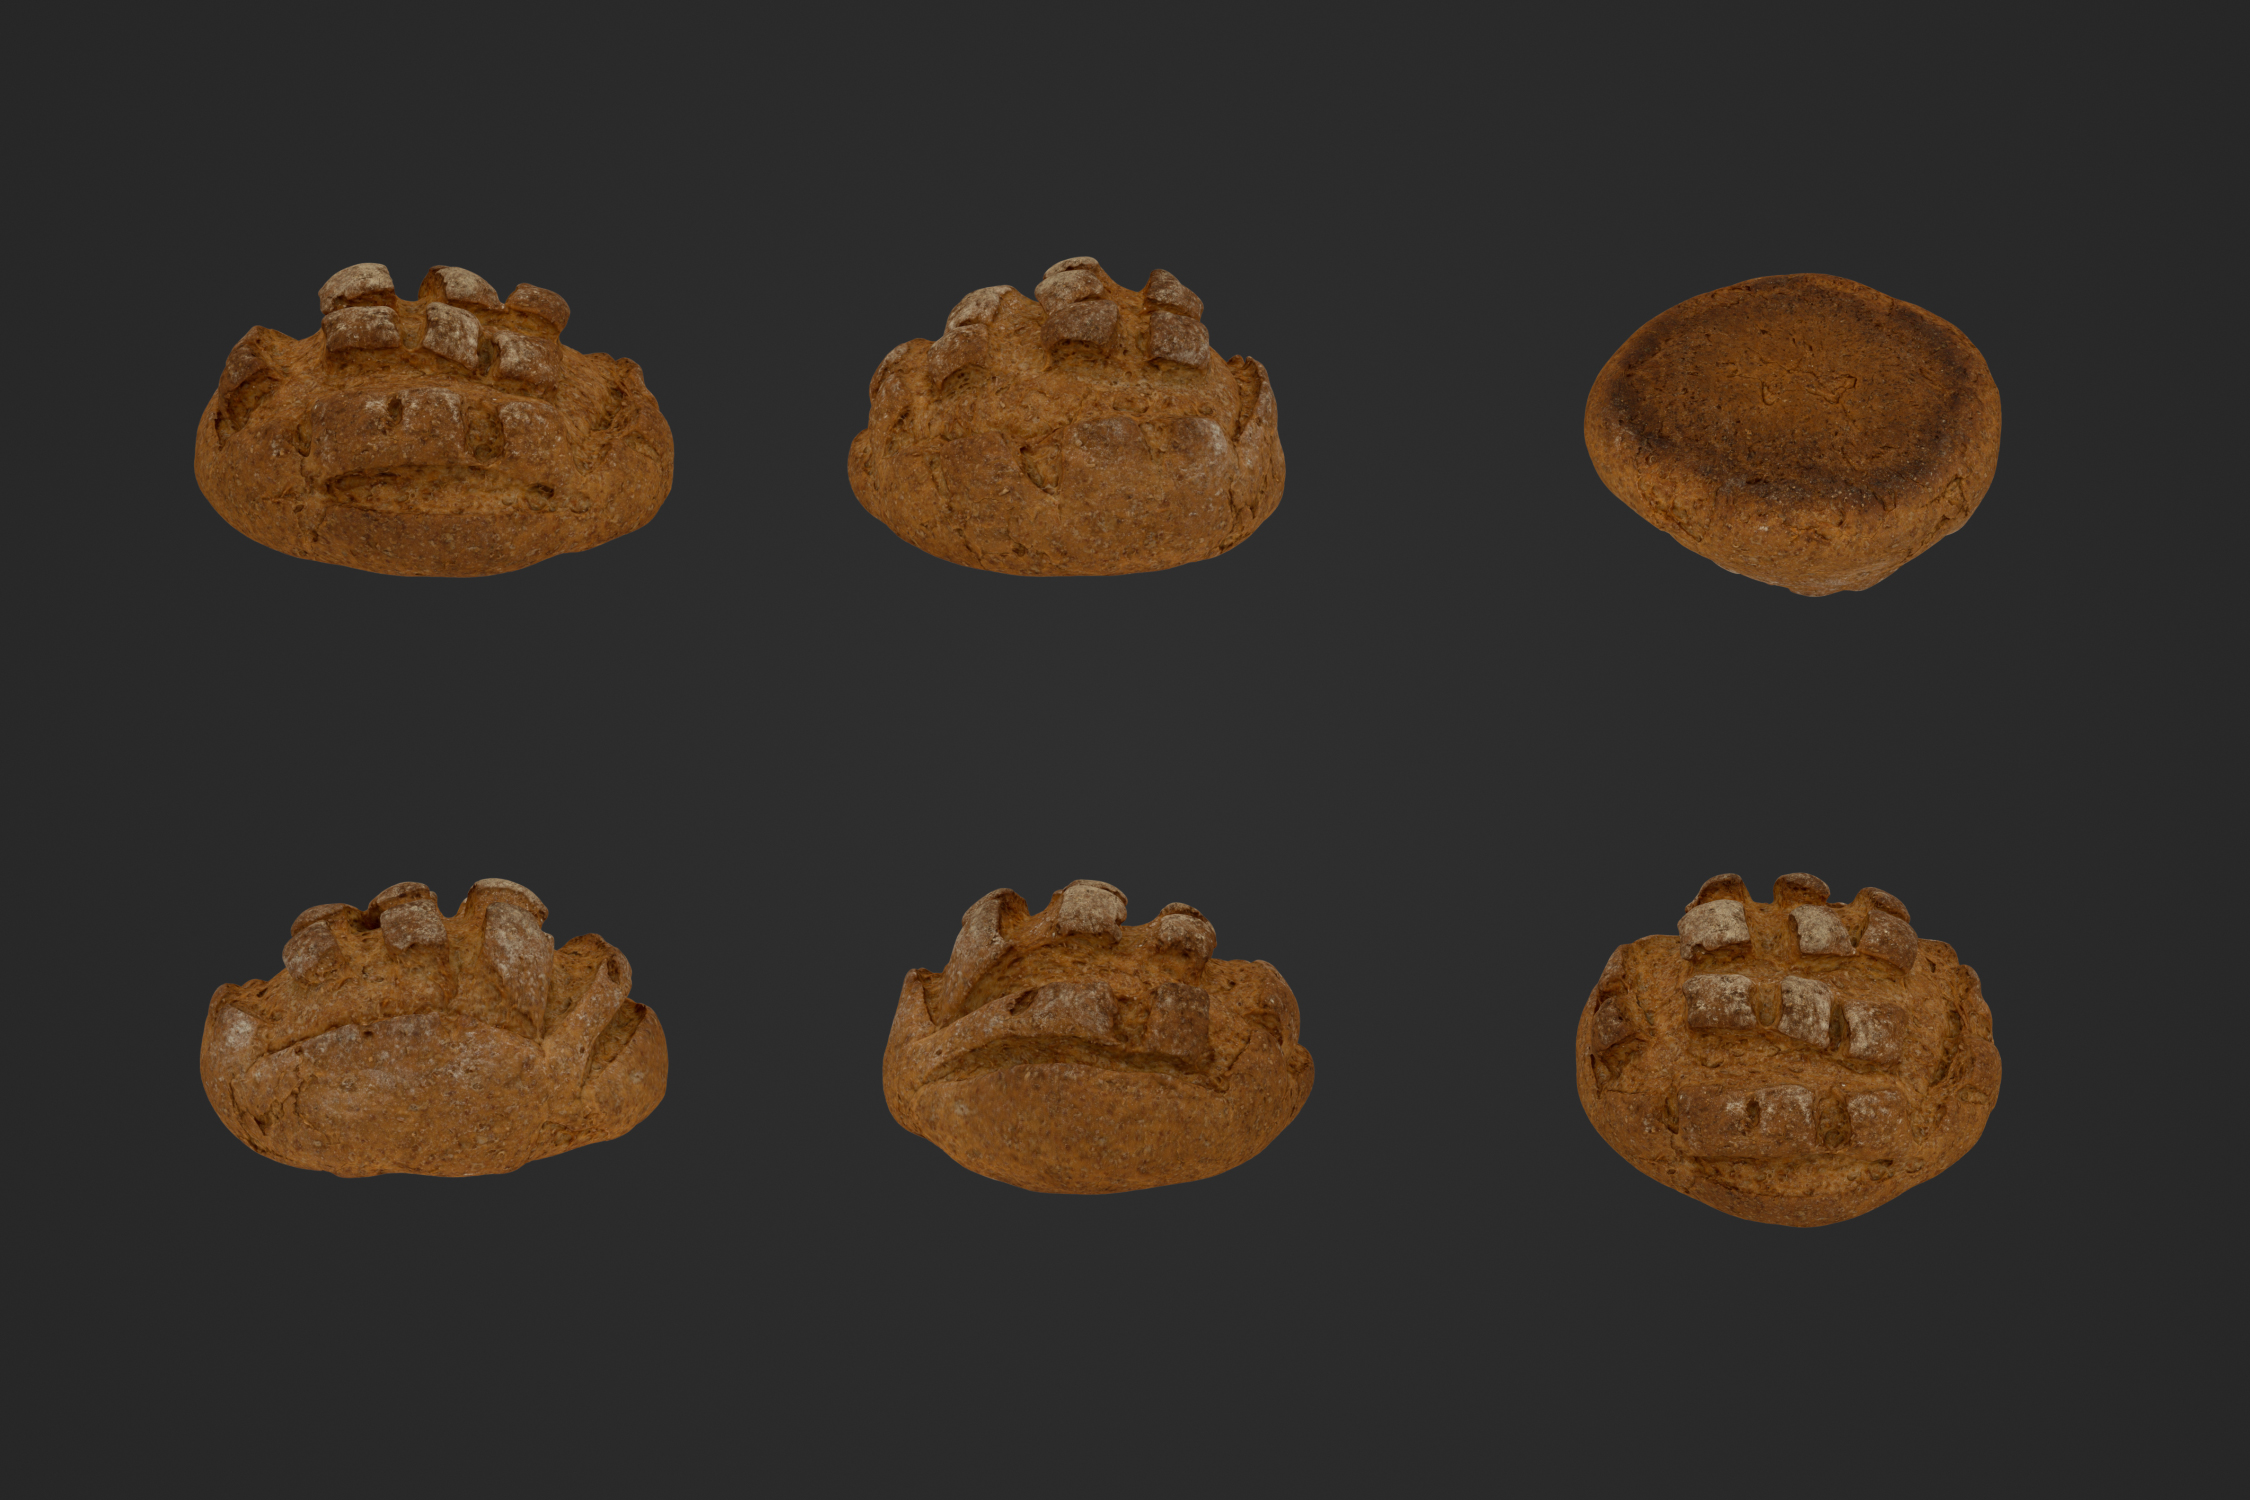 Large_Bread_Roll_1_1.jpg